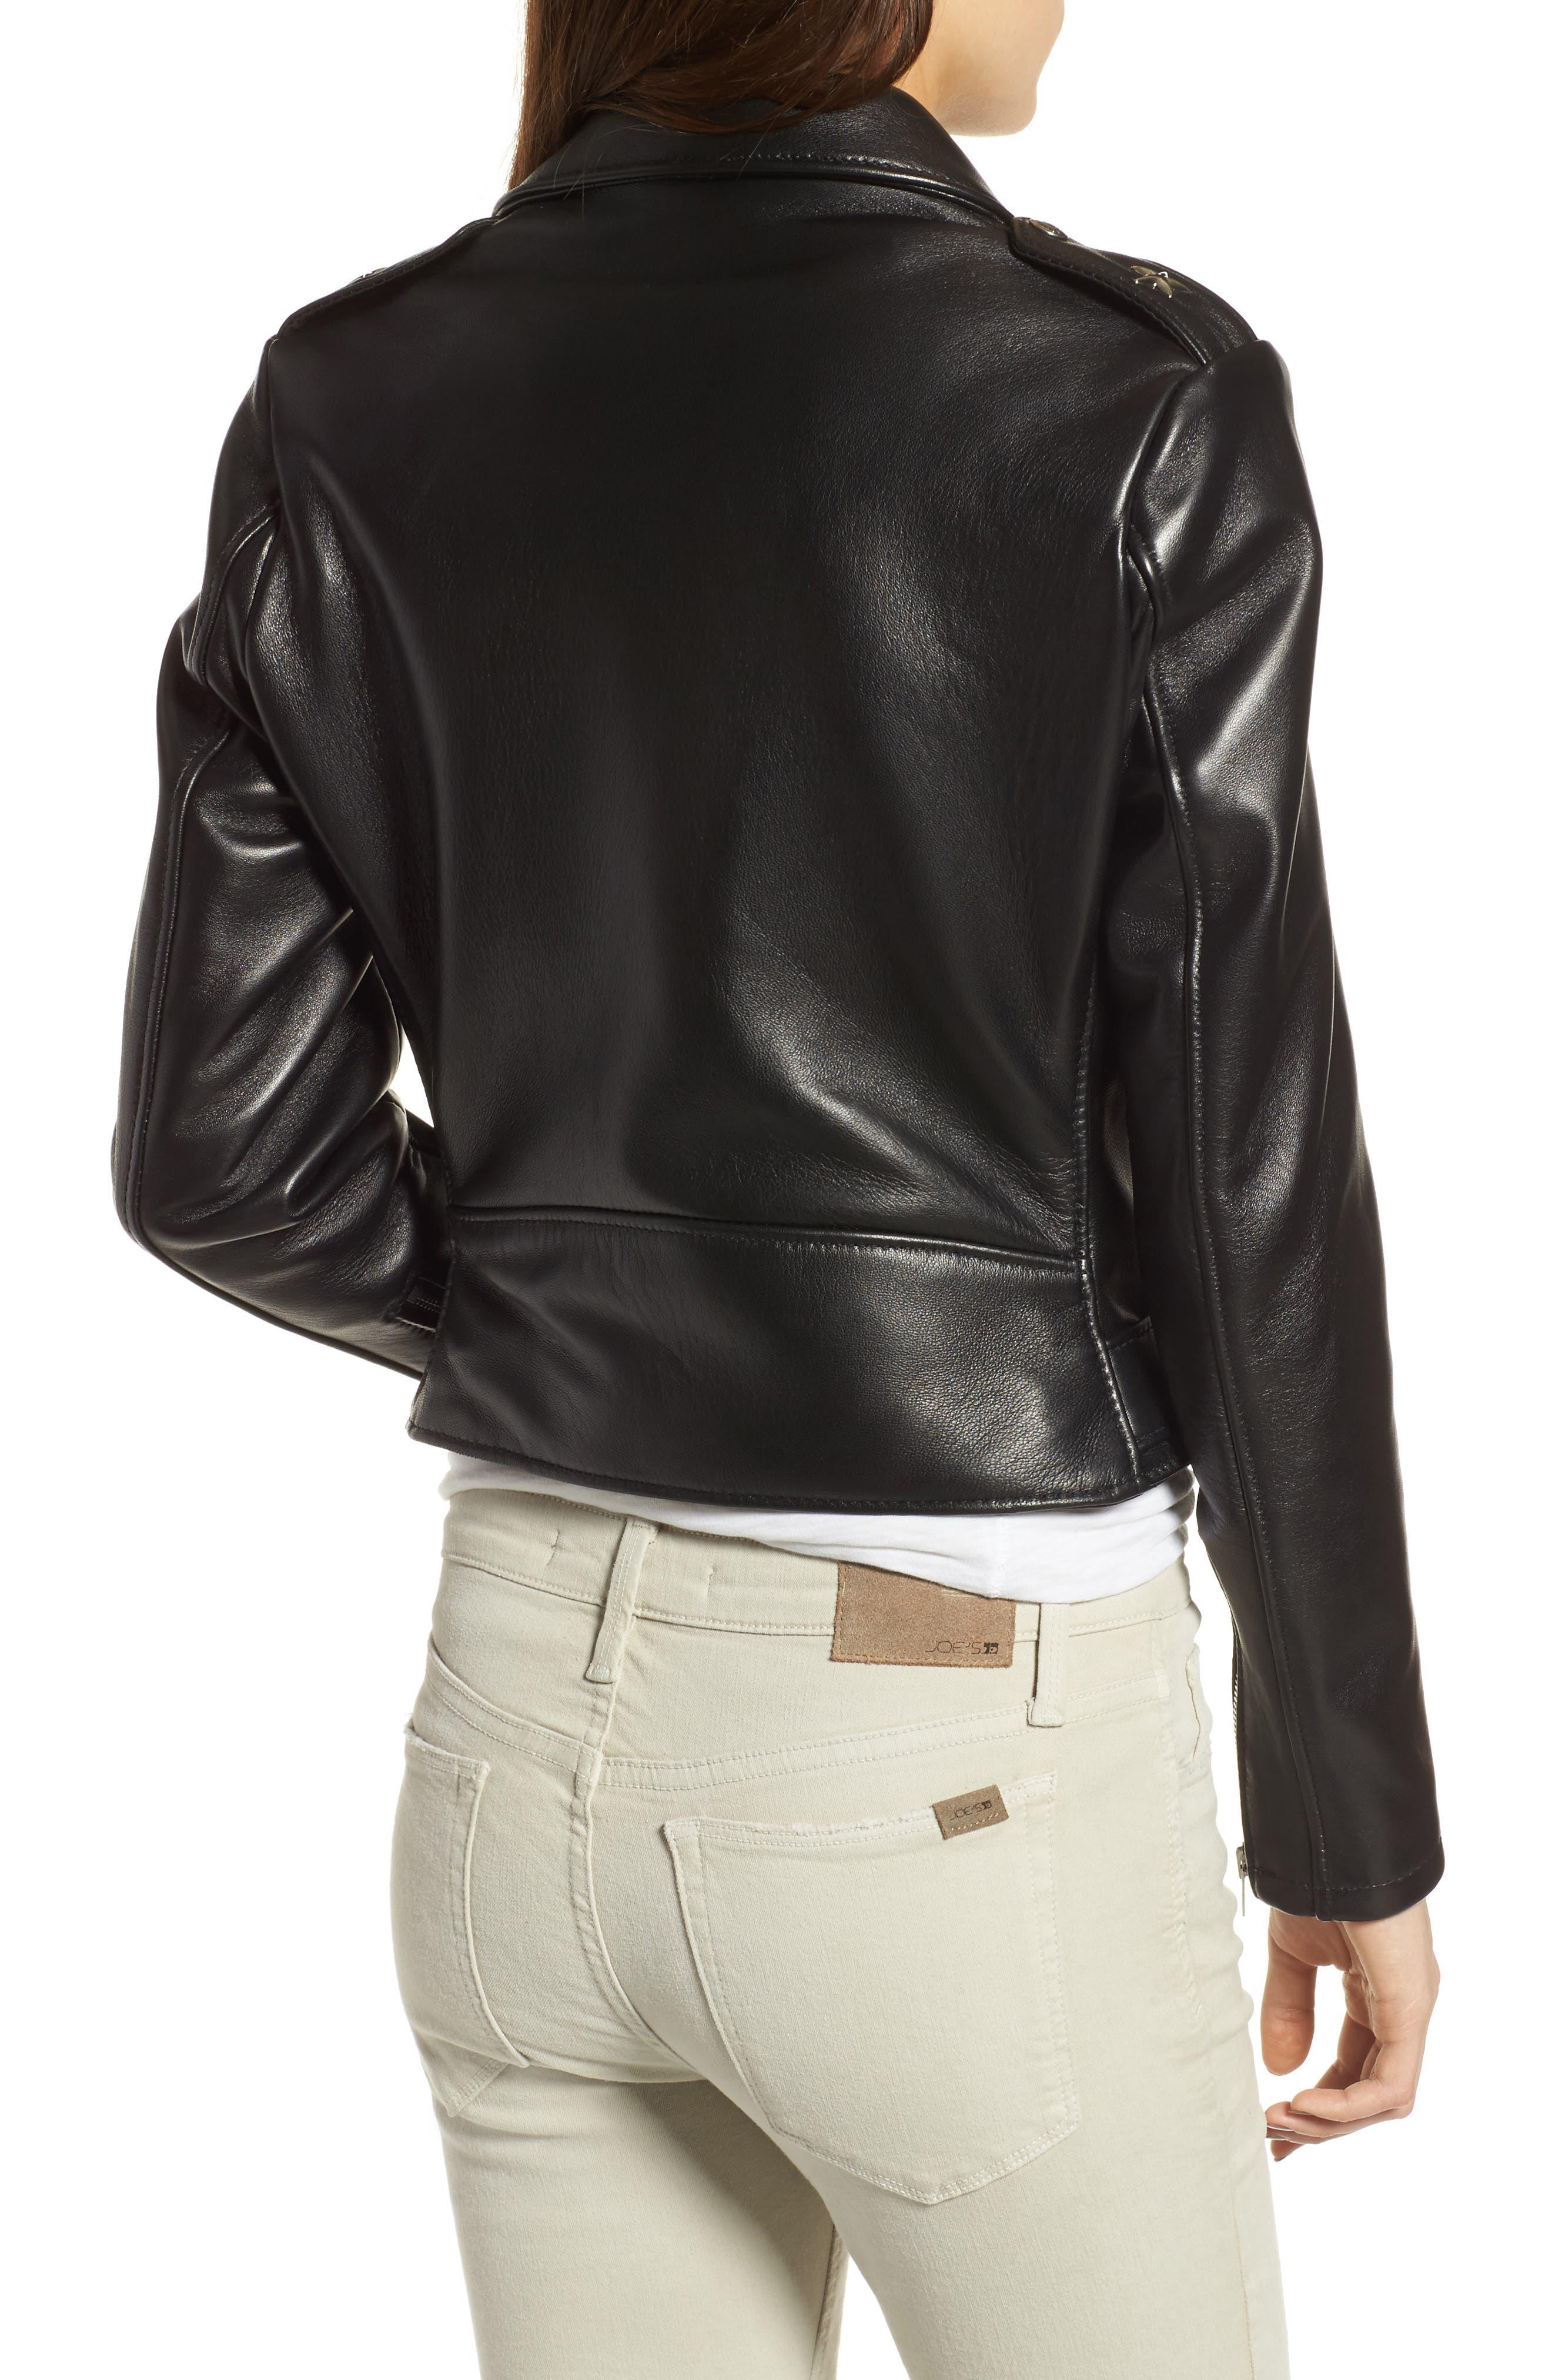 Perfecto Crop Leather Jacket,                             Alternate thumbnail 2, color,                             Black